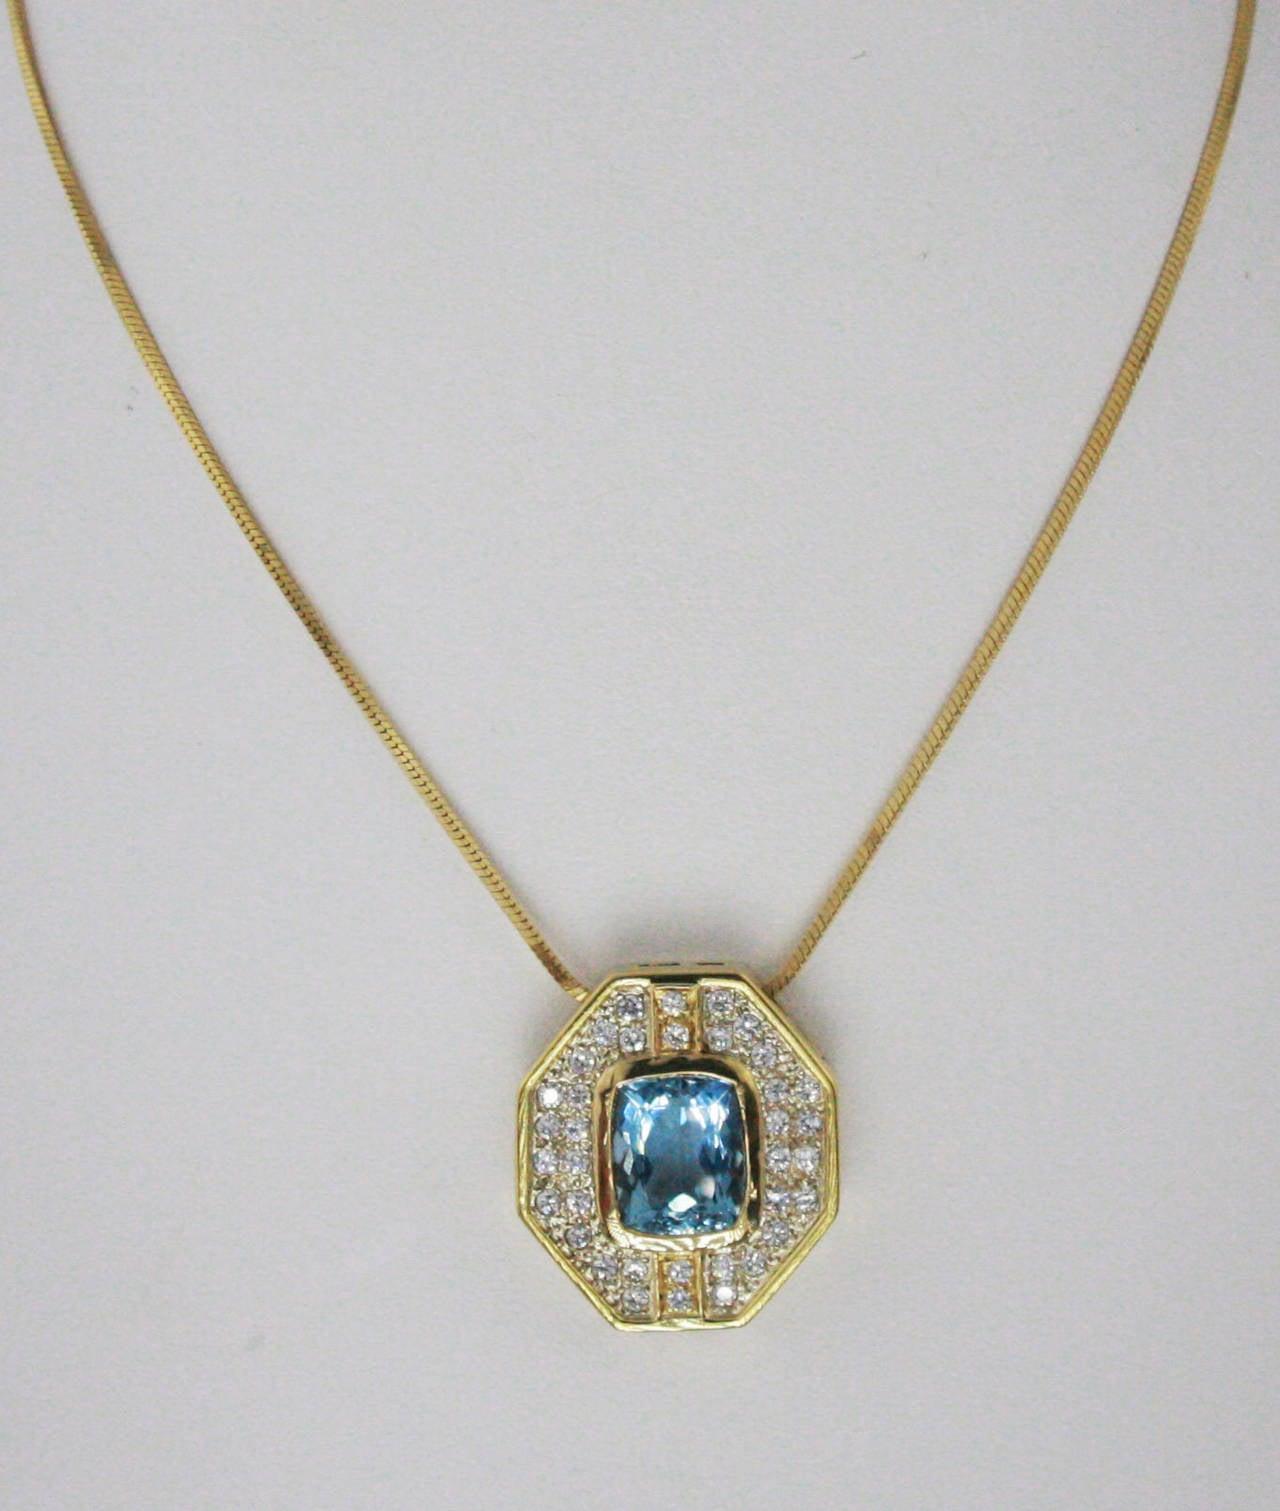 5.5 Carat Aquamarine & Diamond Gold Pendant Necklace For Sale 2